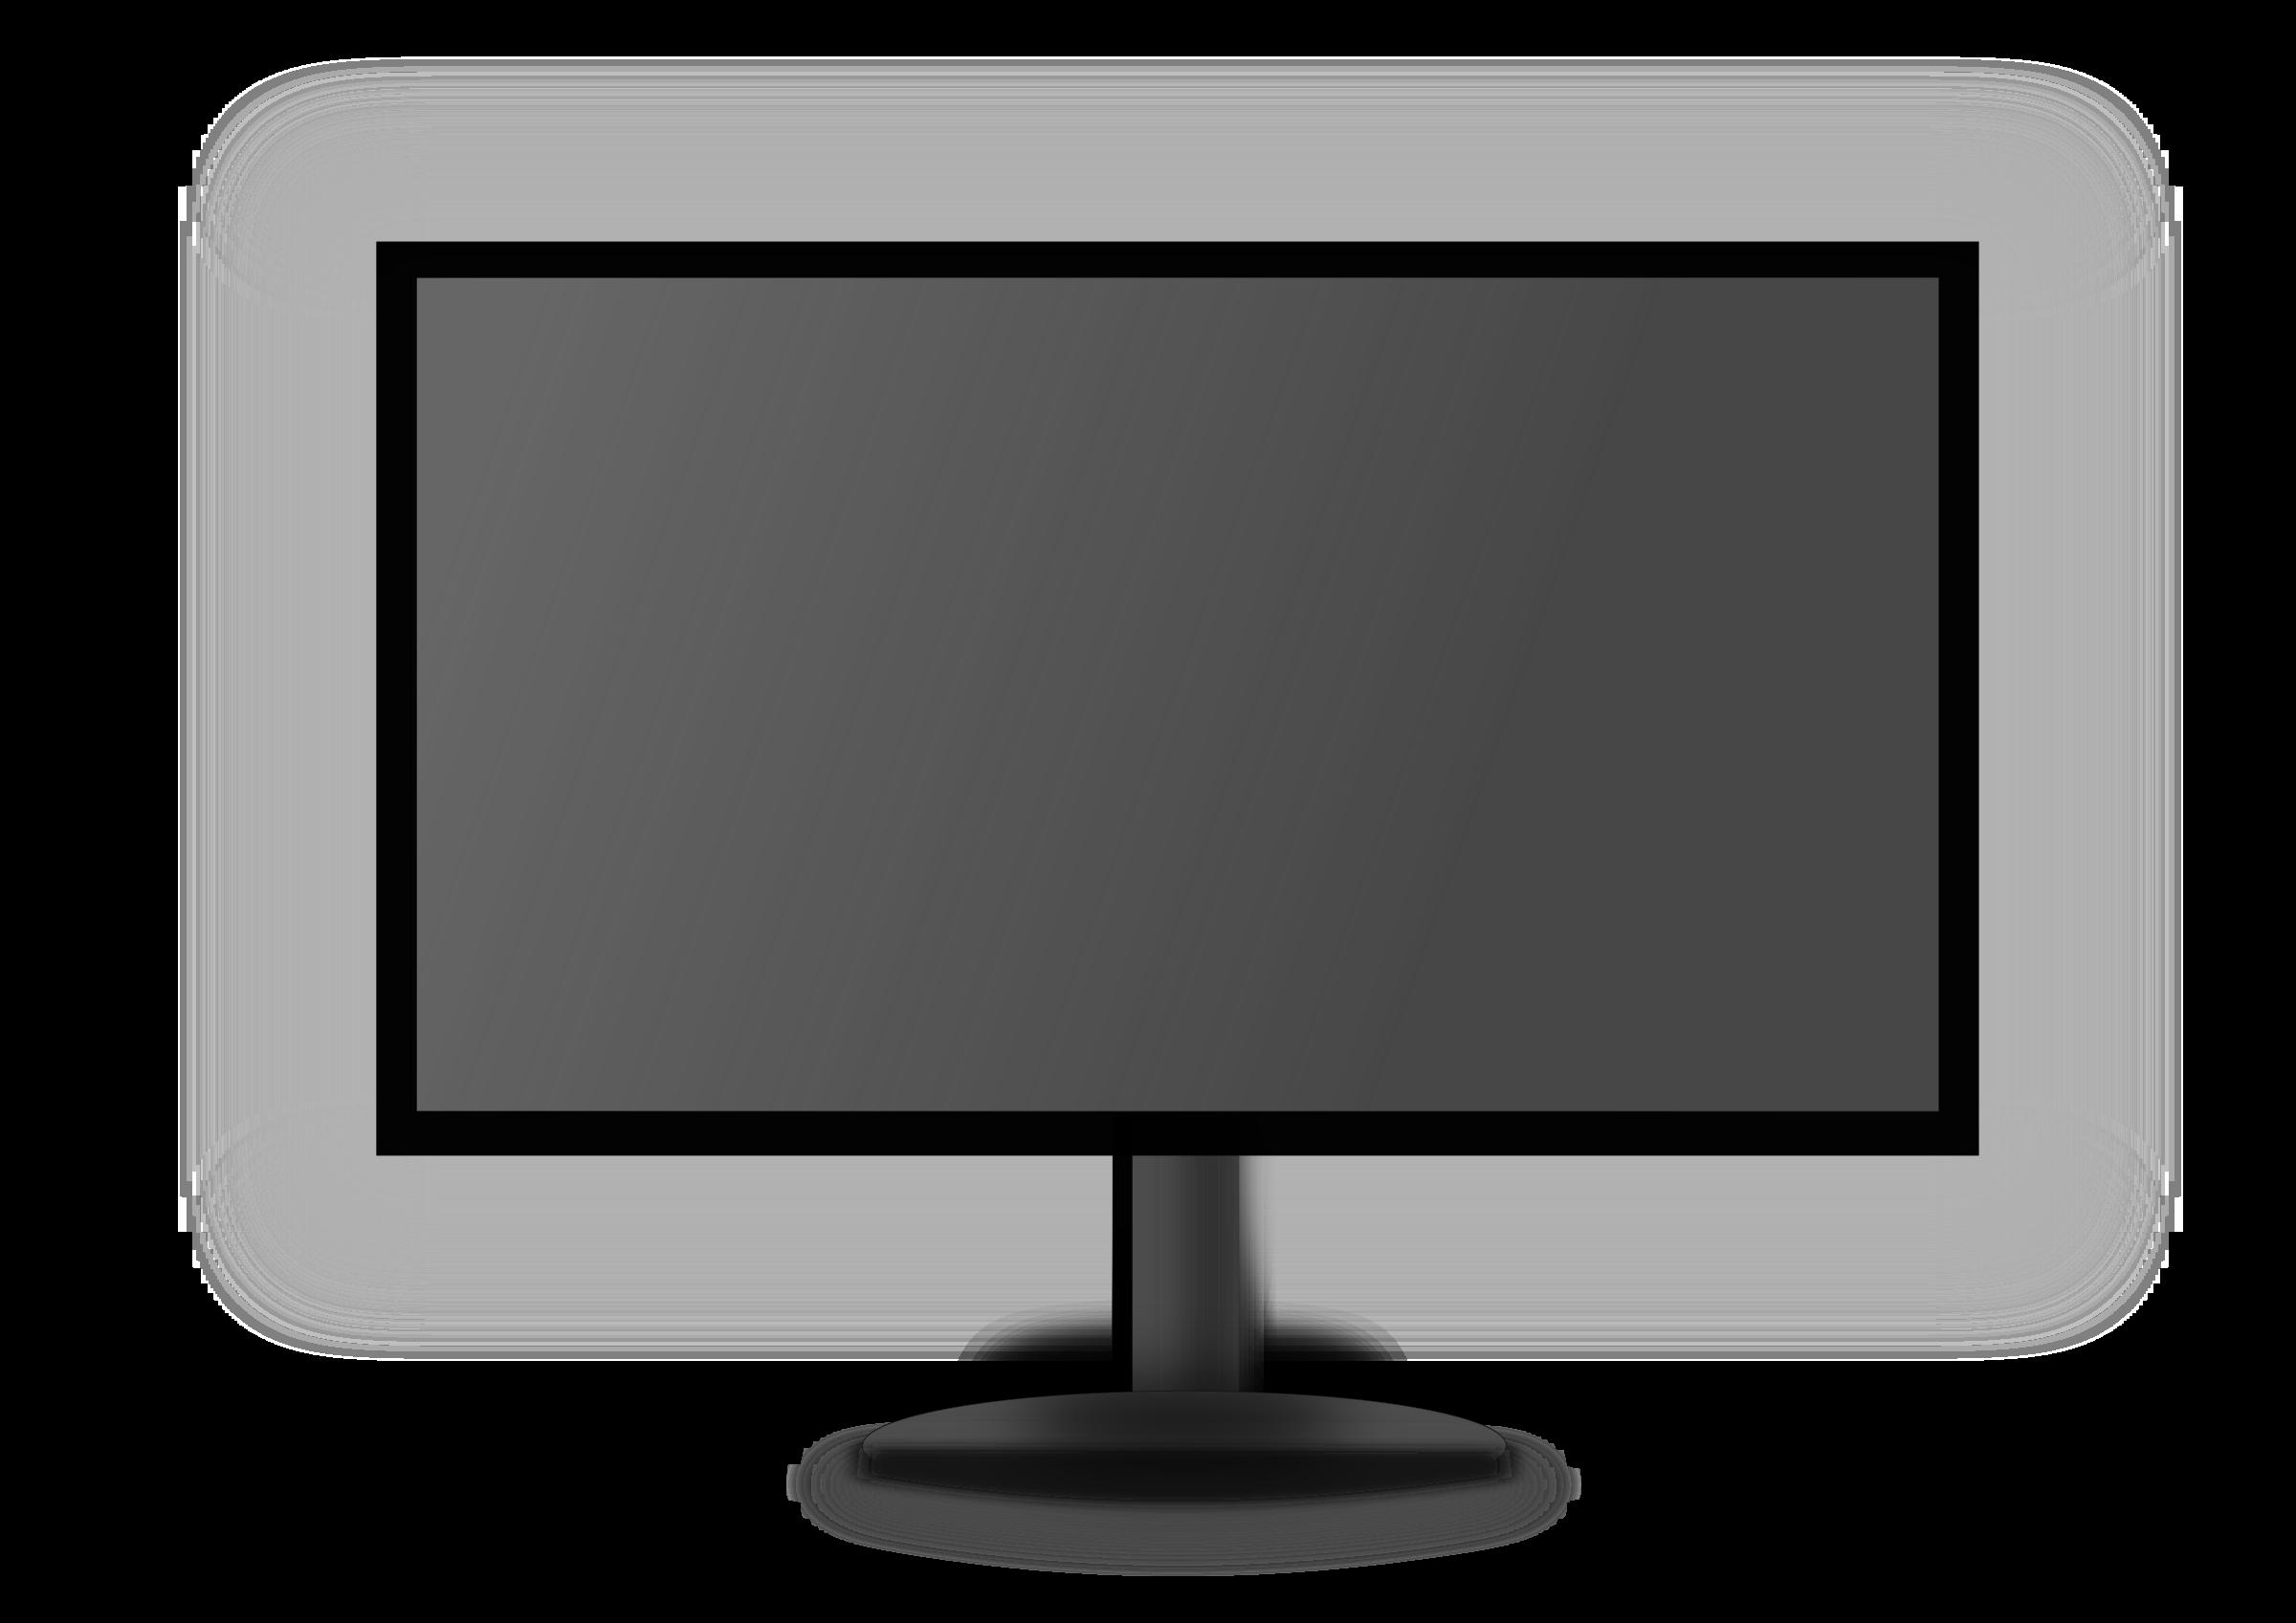 Clipart - LED Monitor_Grey screen